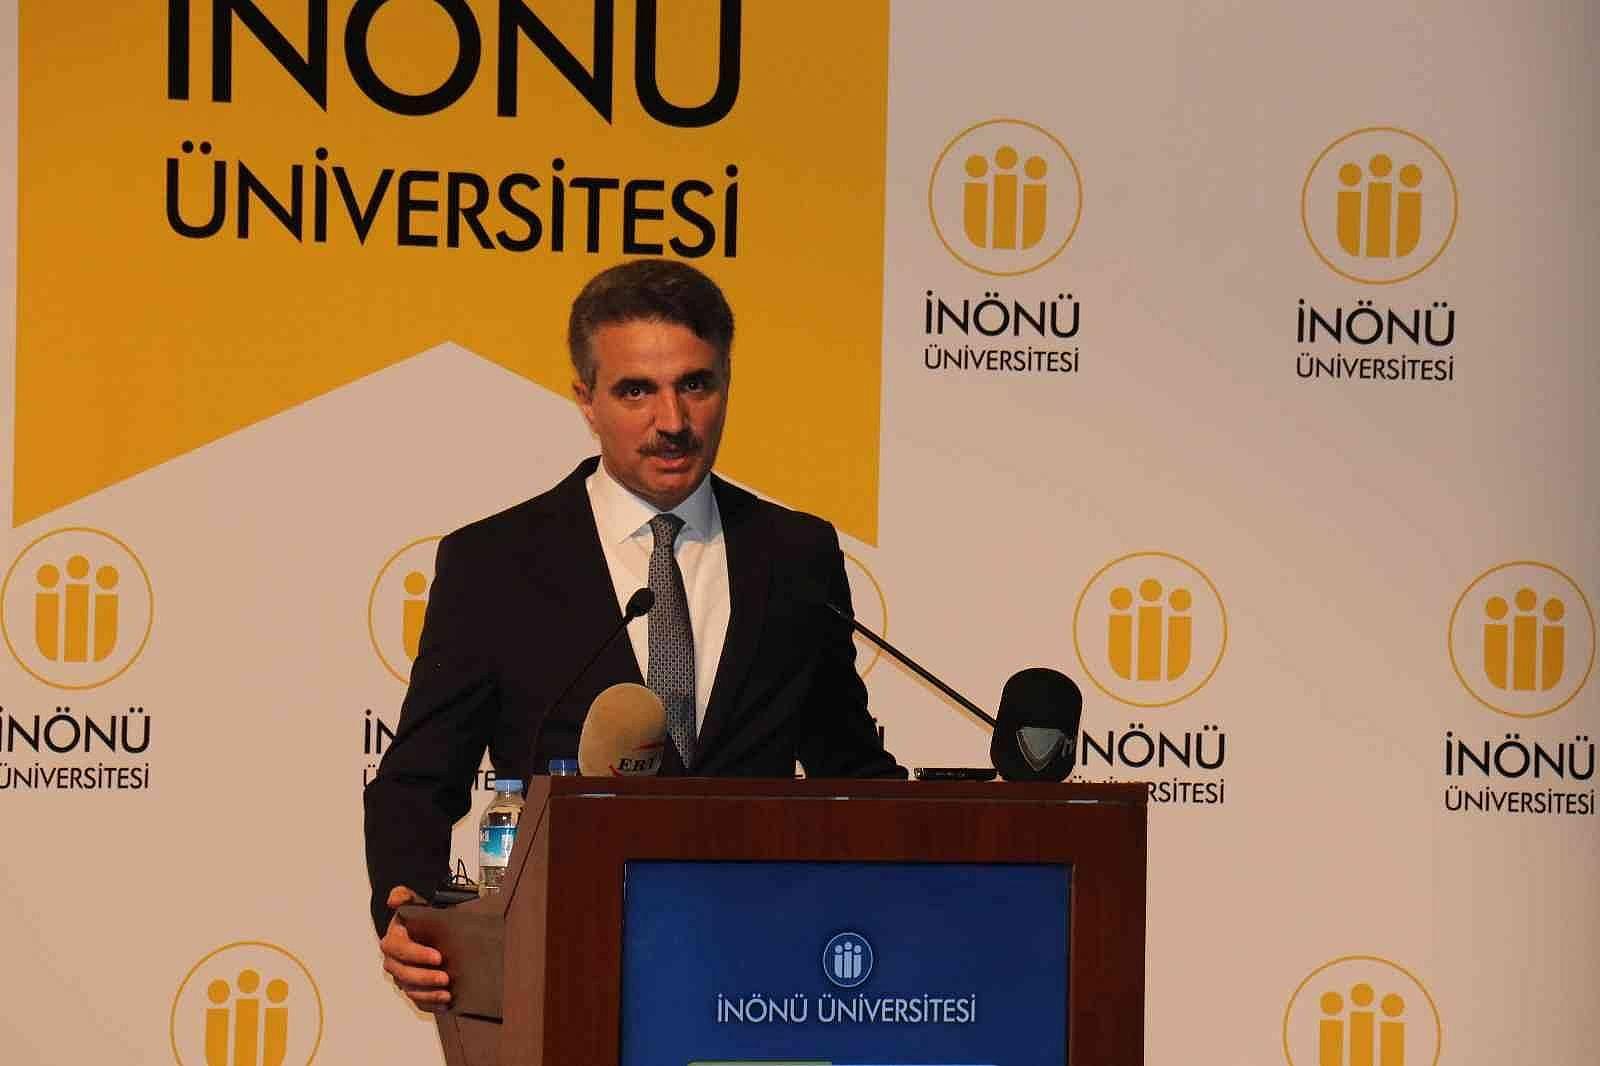 2021/10/inonu-universitesi-2021-2022-egitim-ogretim-yili-akademik-acilisi-20211013AW44-3.jpg